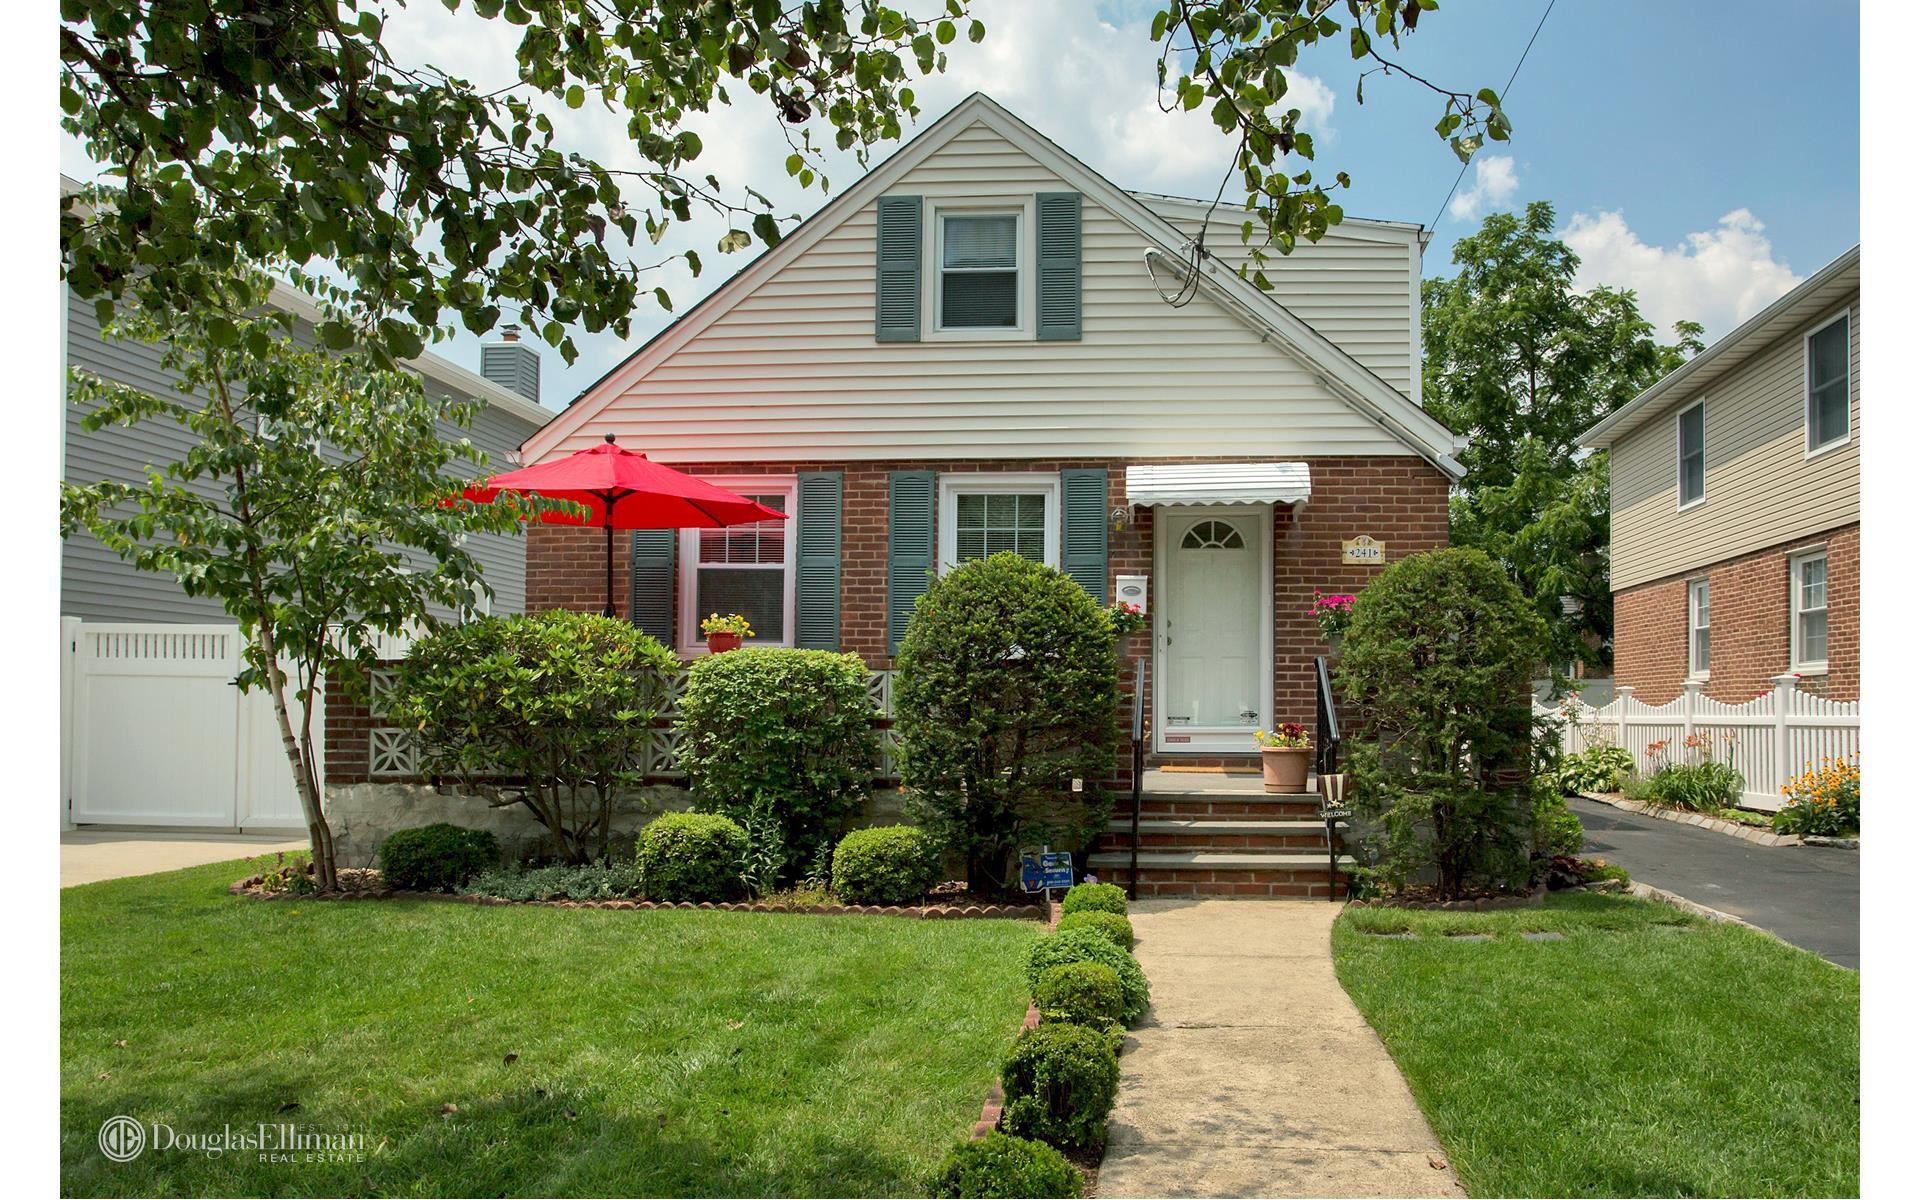 241 Wellington Rd S, Garden City, NY 11530 - Estimate and Home ...